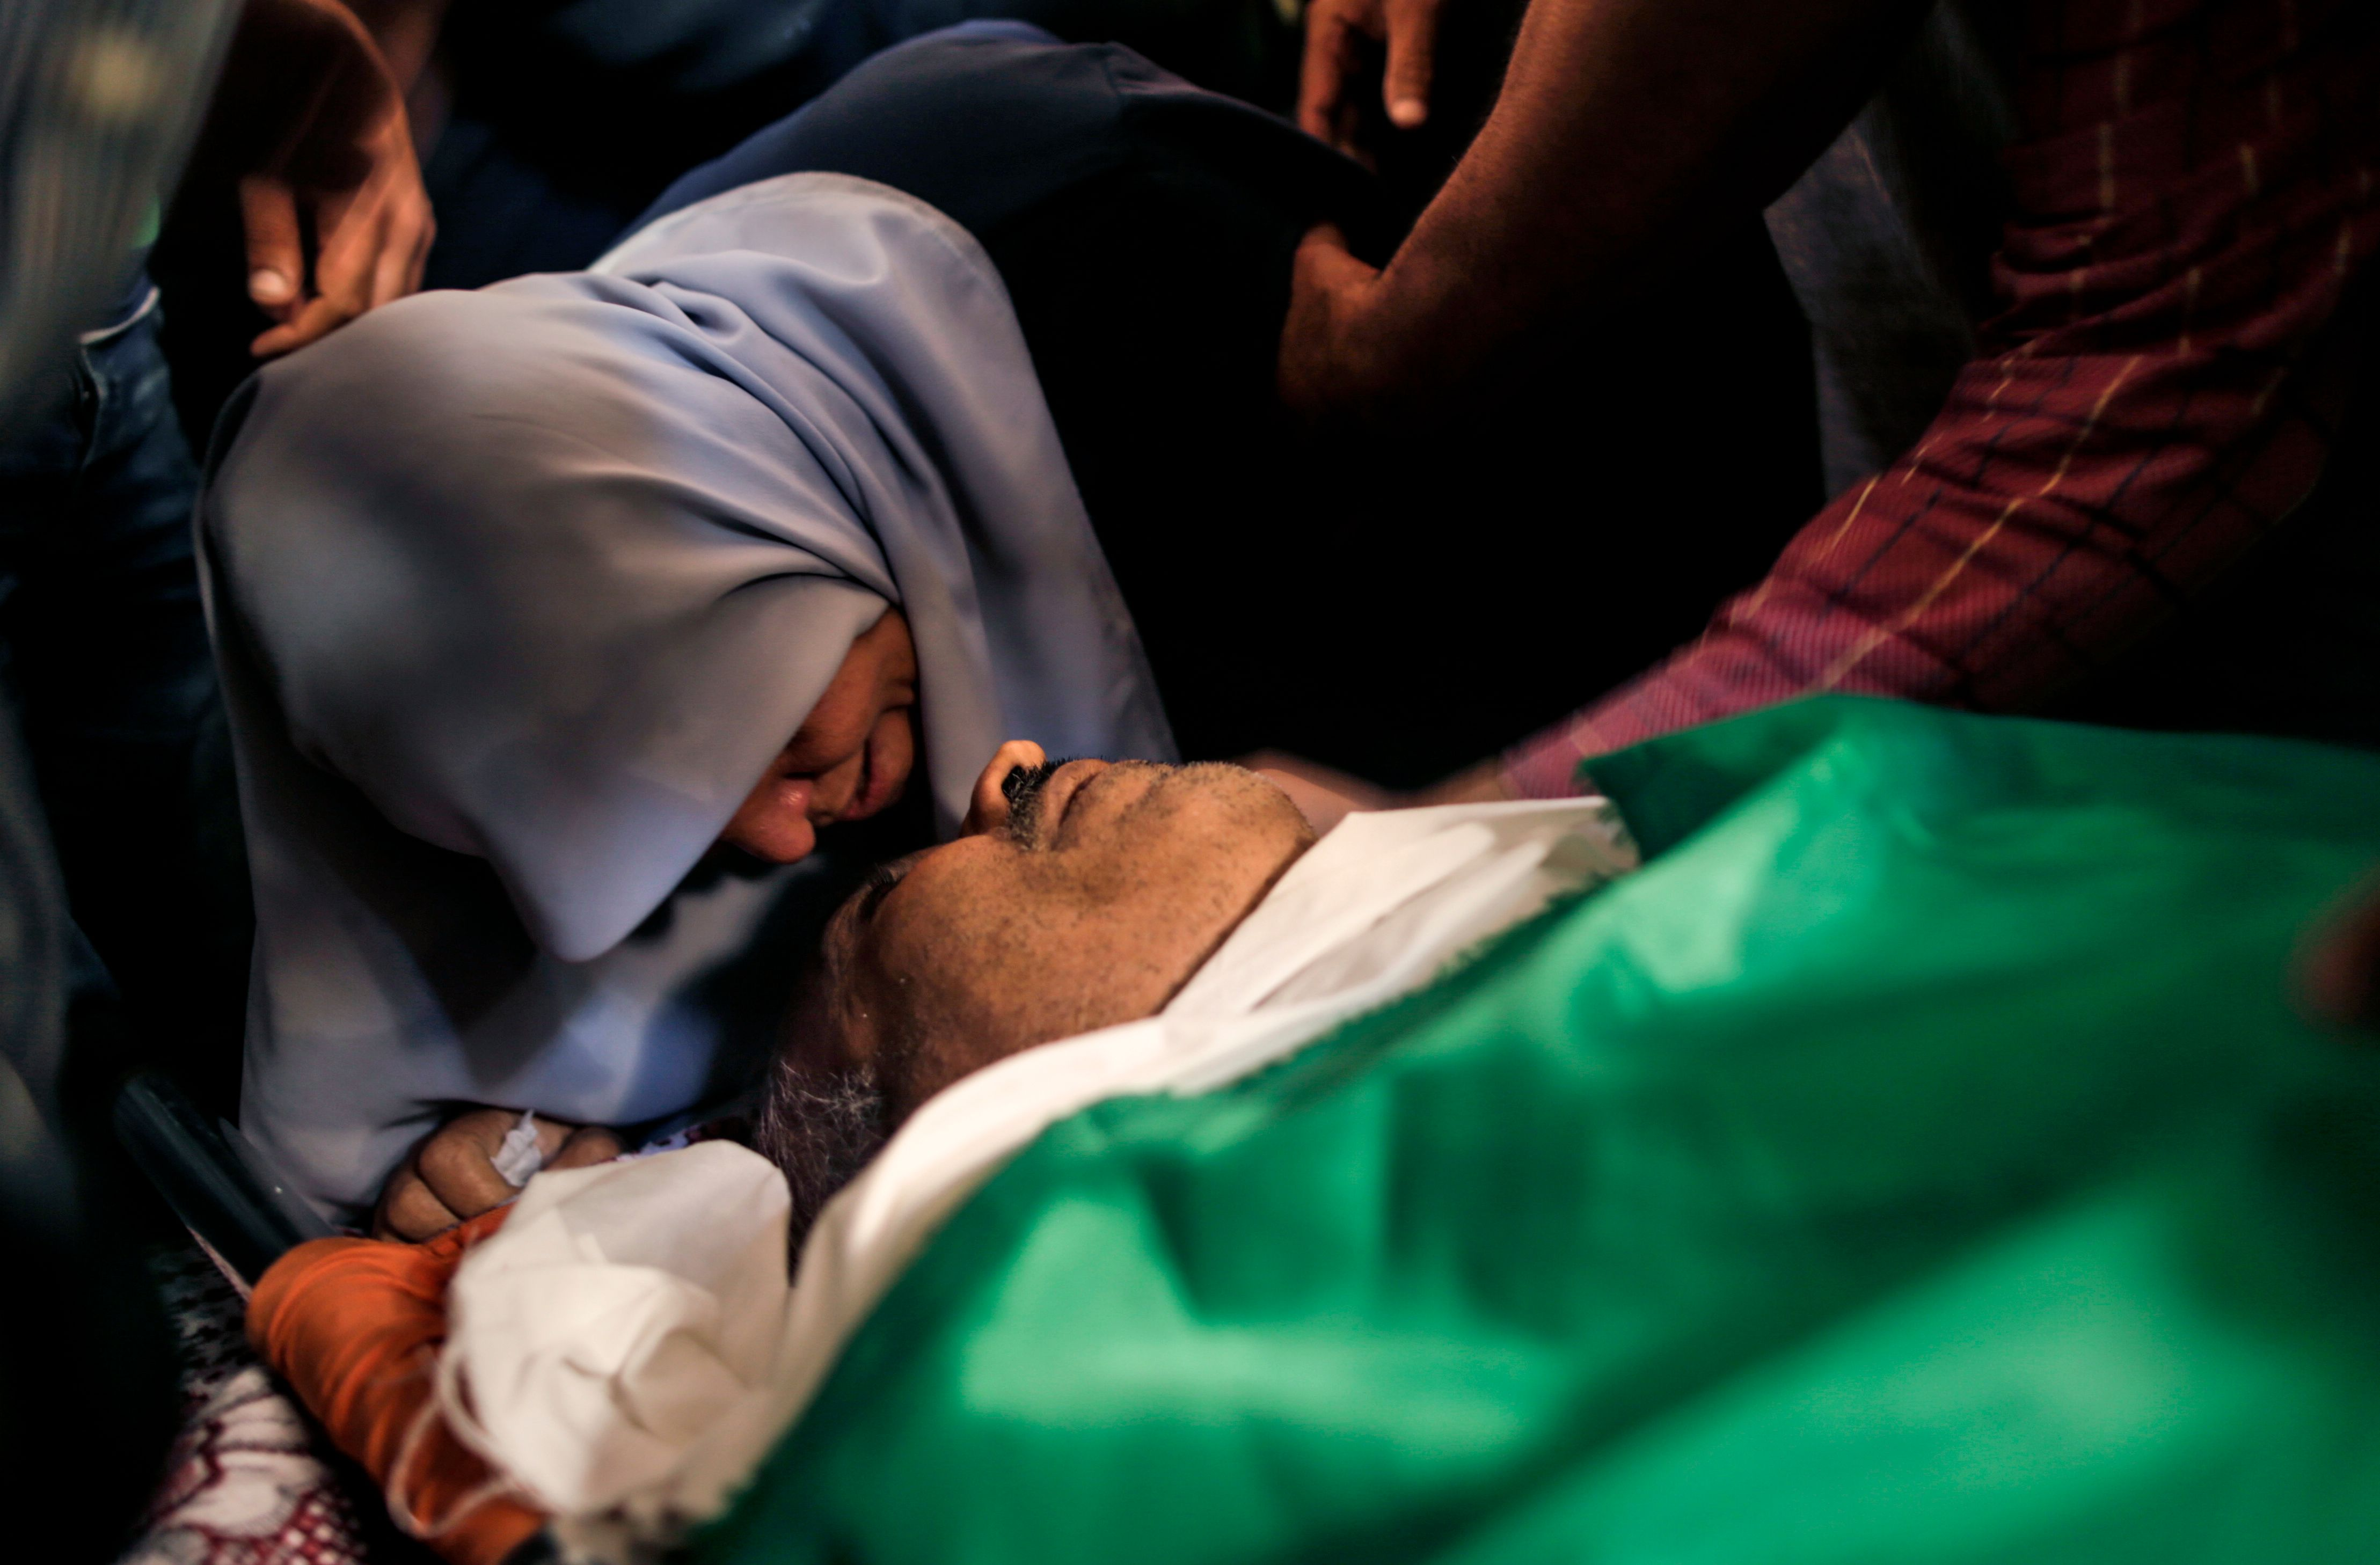 تشييع جثمان الشهيد ناصر غراب  (2)